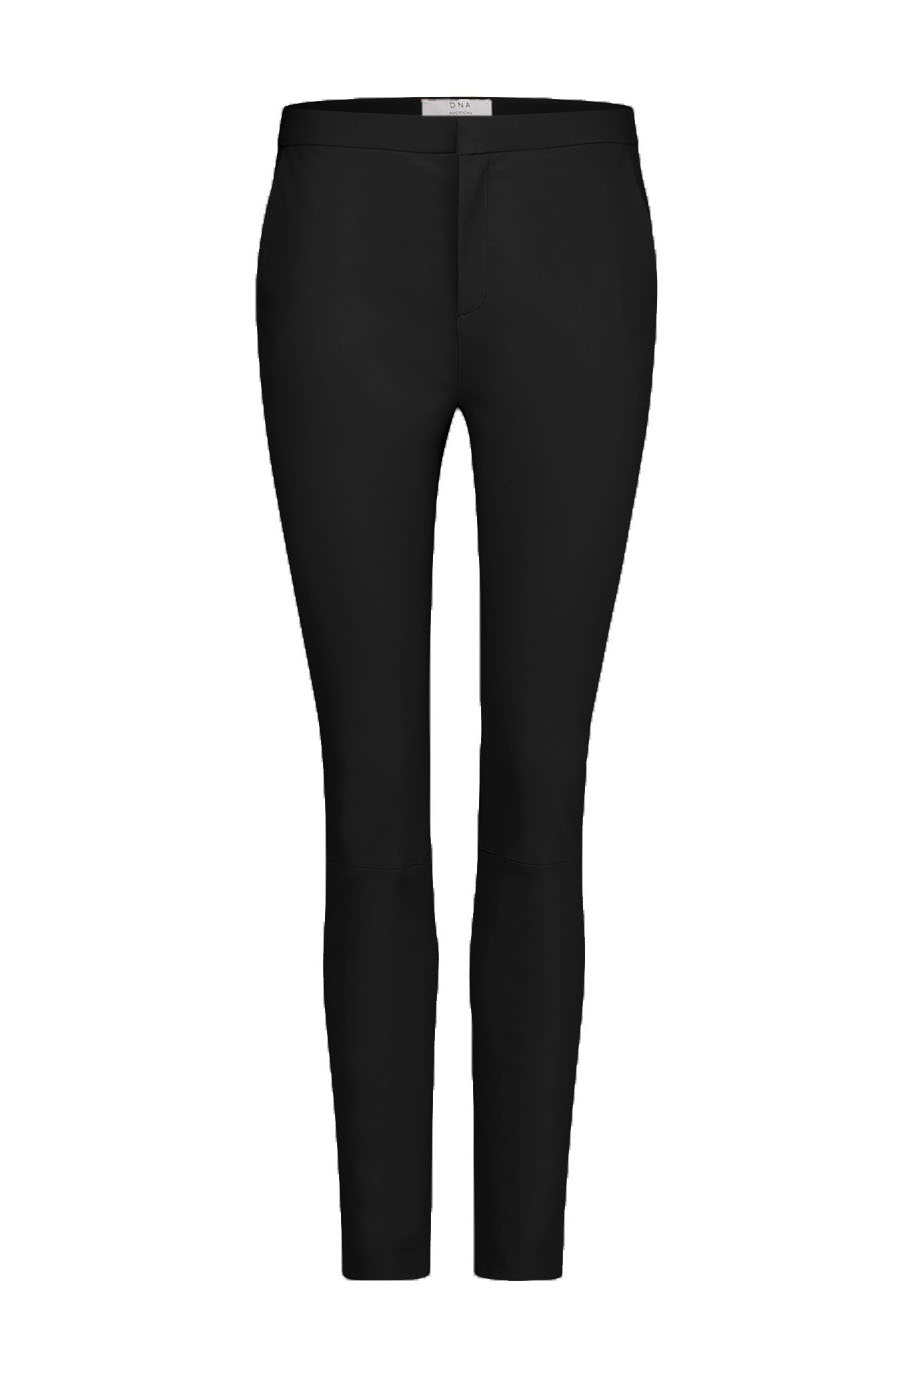 Pardau Leather Pant - Black-1